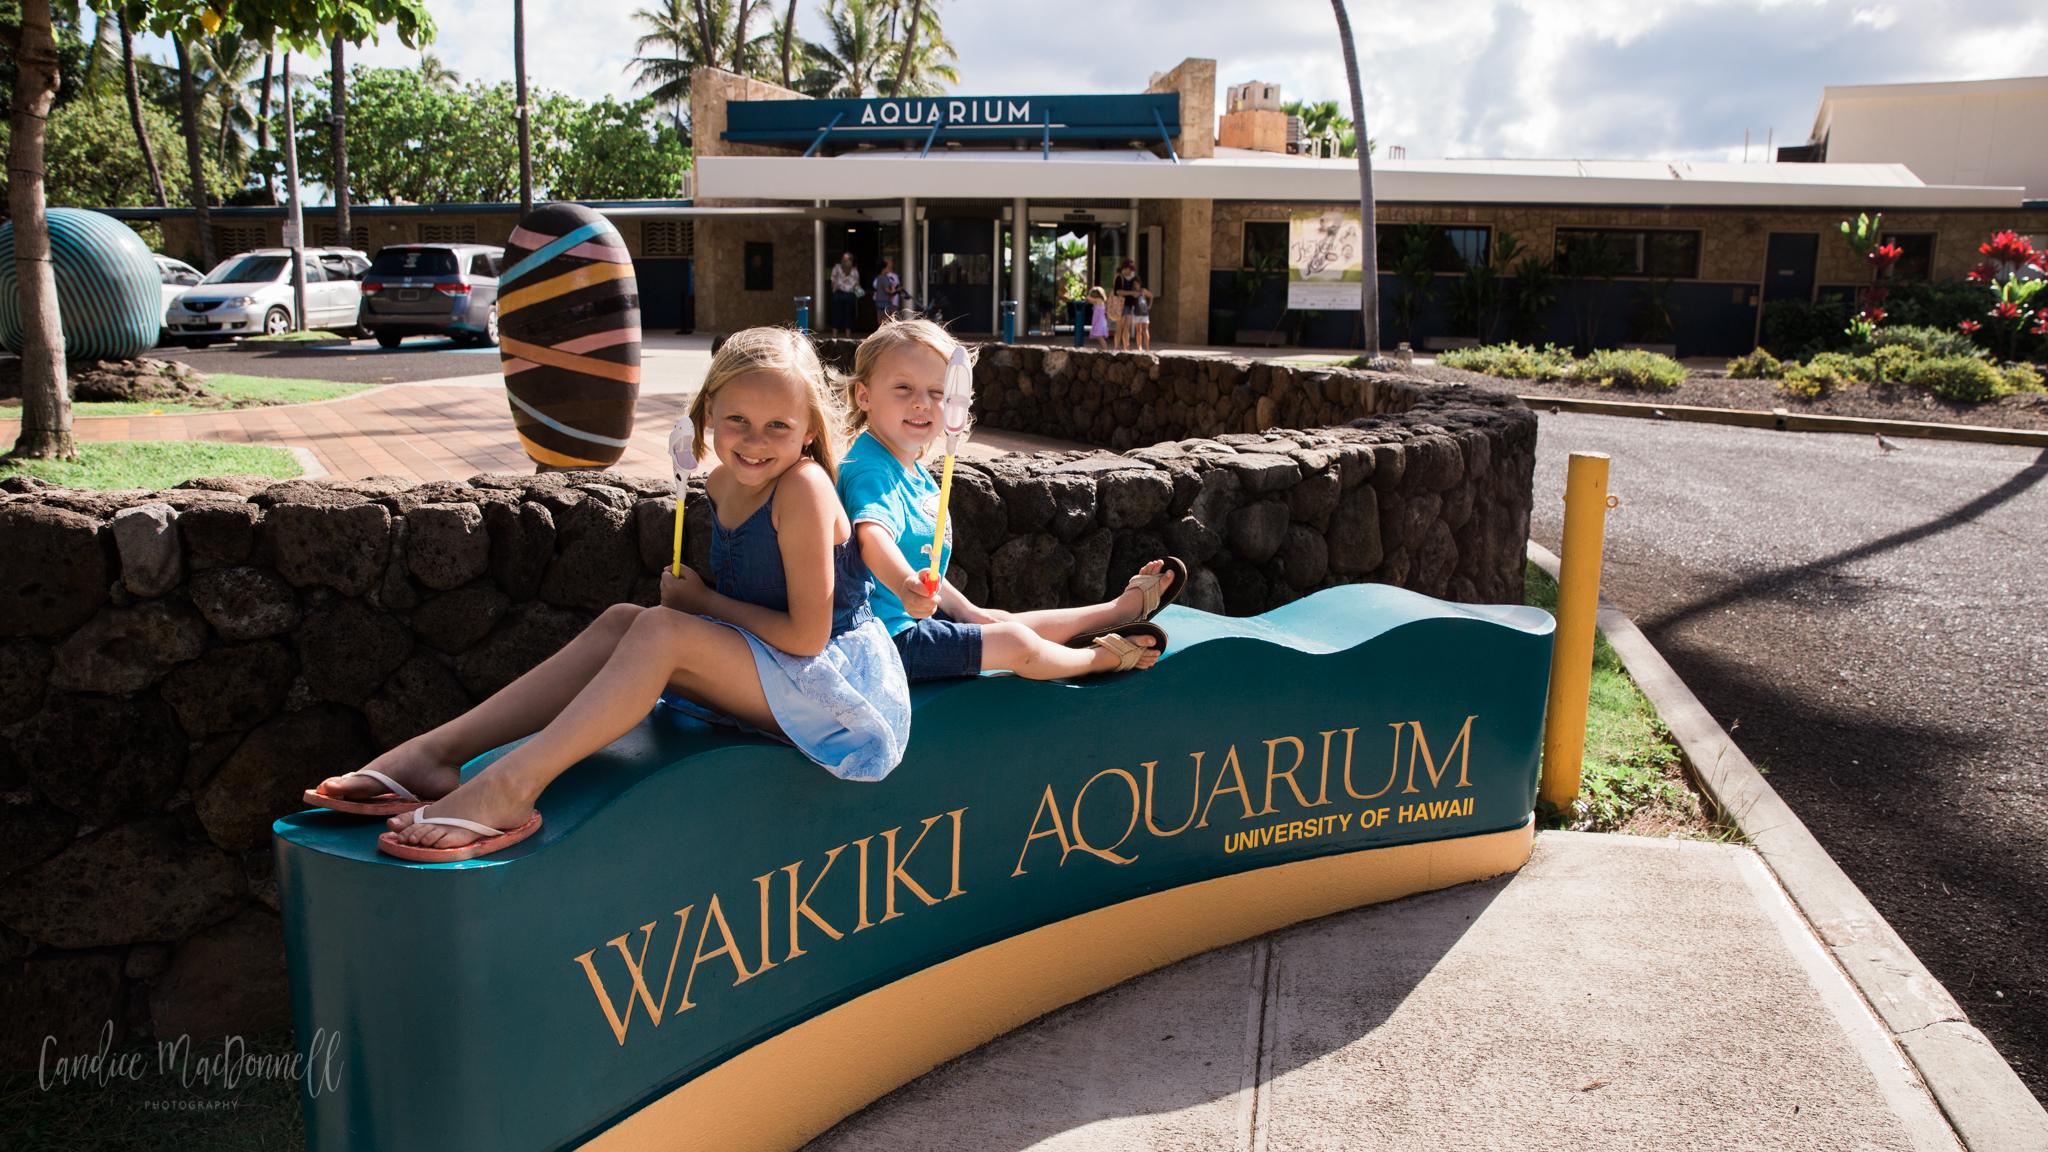 kids at waikiki aquarium honolulu hawaii